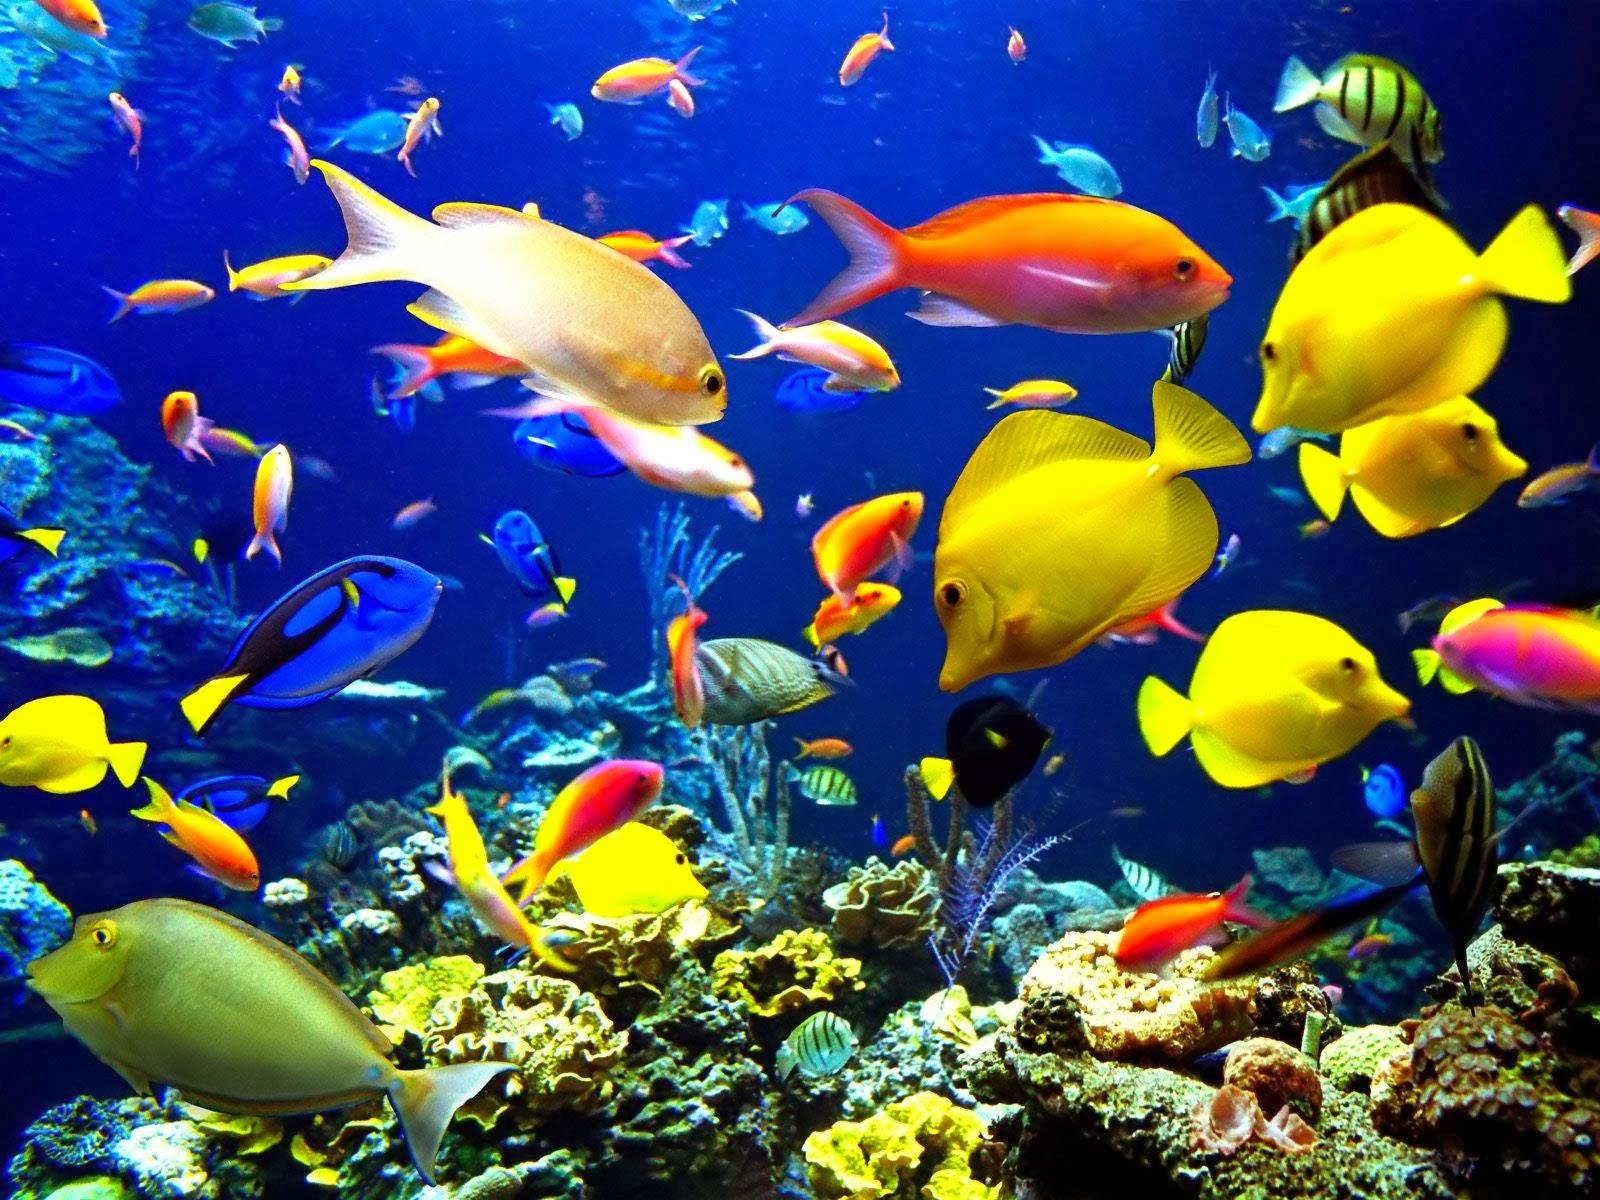 Wallpaper Animasi 3d Aquarium Bergerak Images